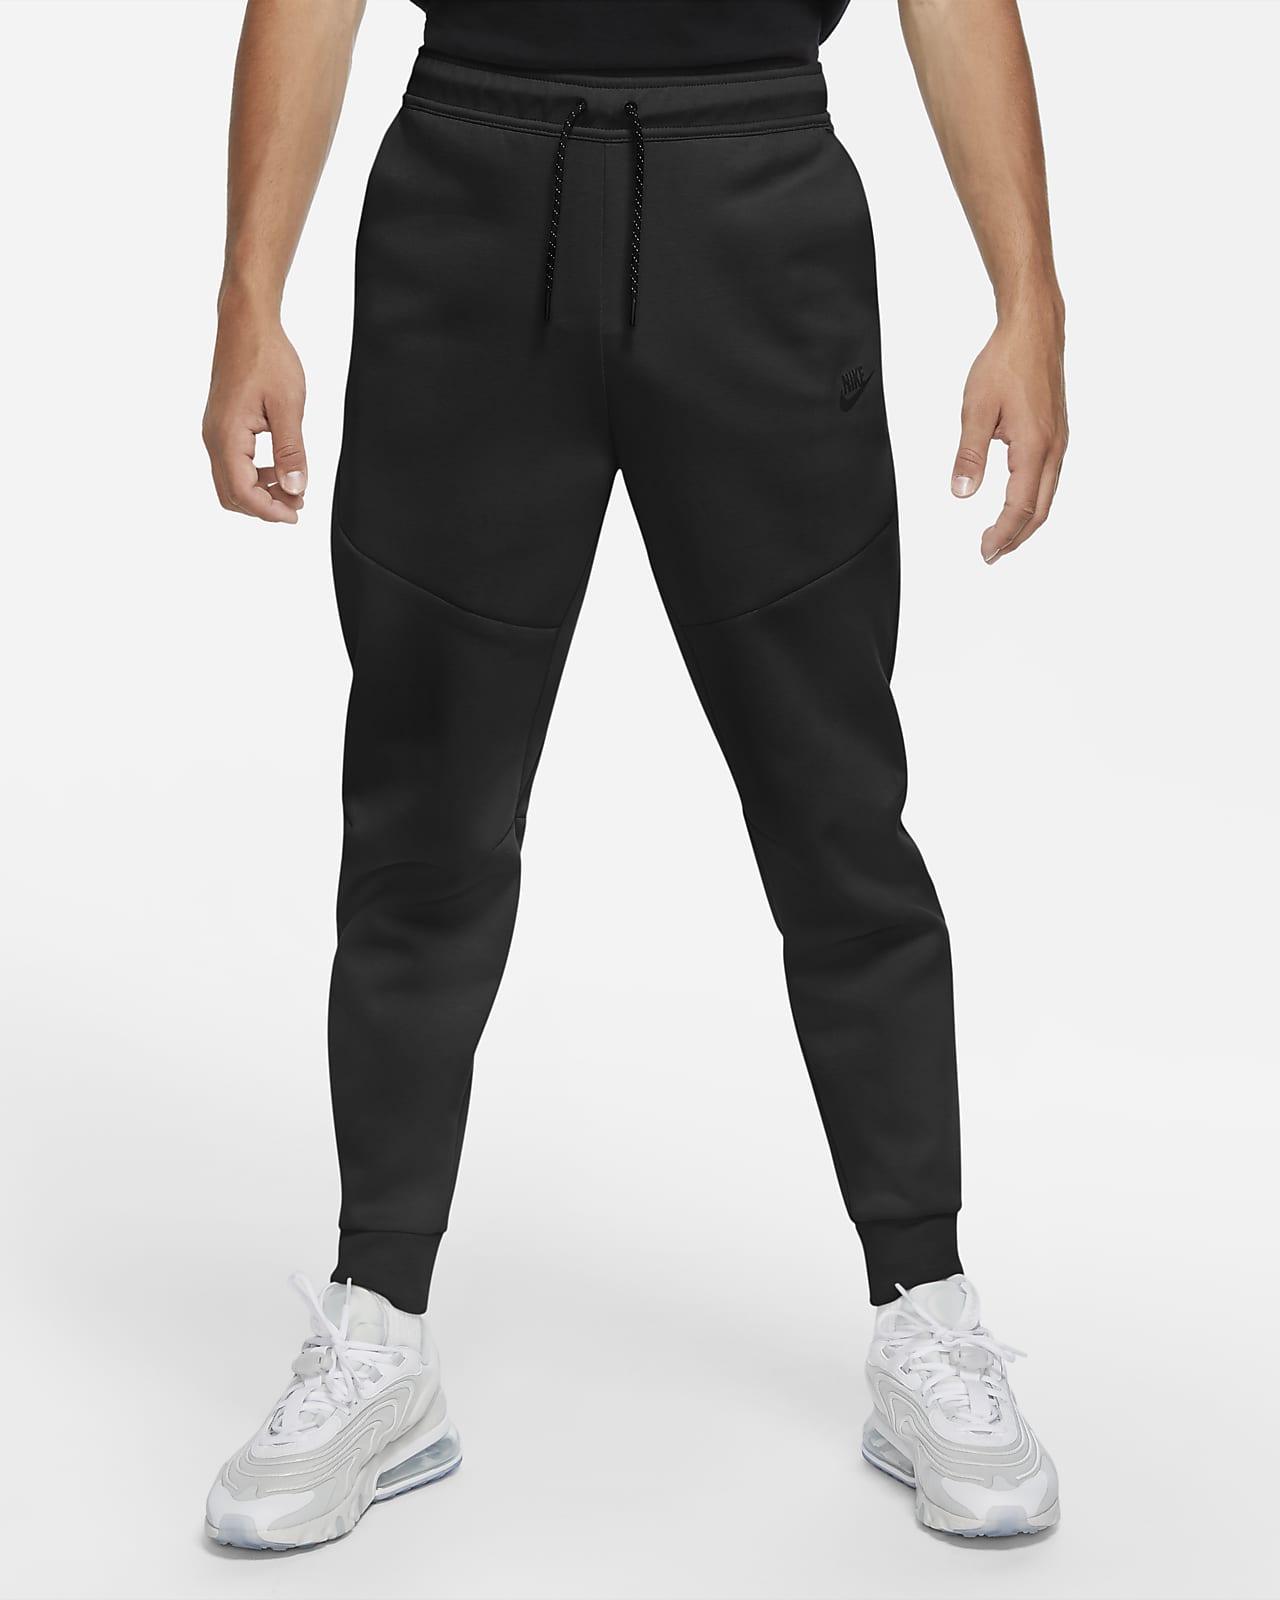 eco político visto ropa  Nike Sportswear Tech Fleece Men's Joggers. Nike LU